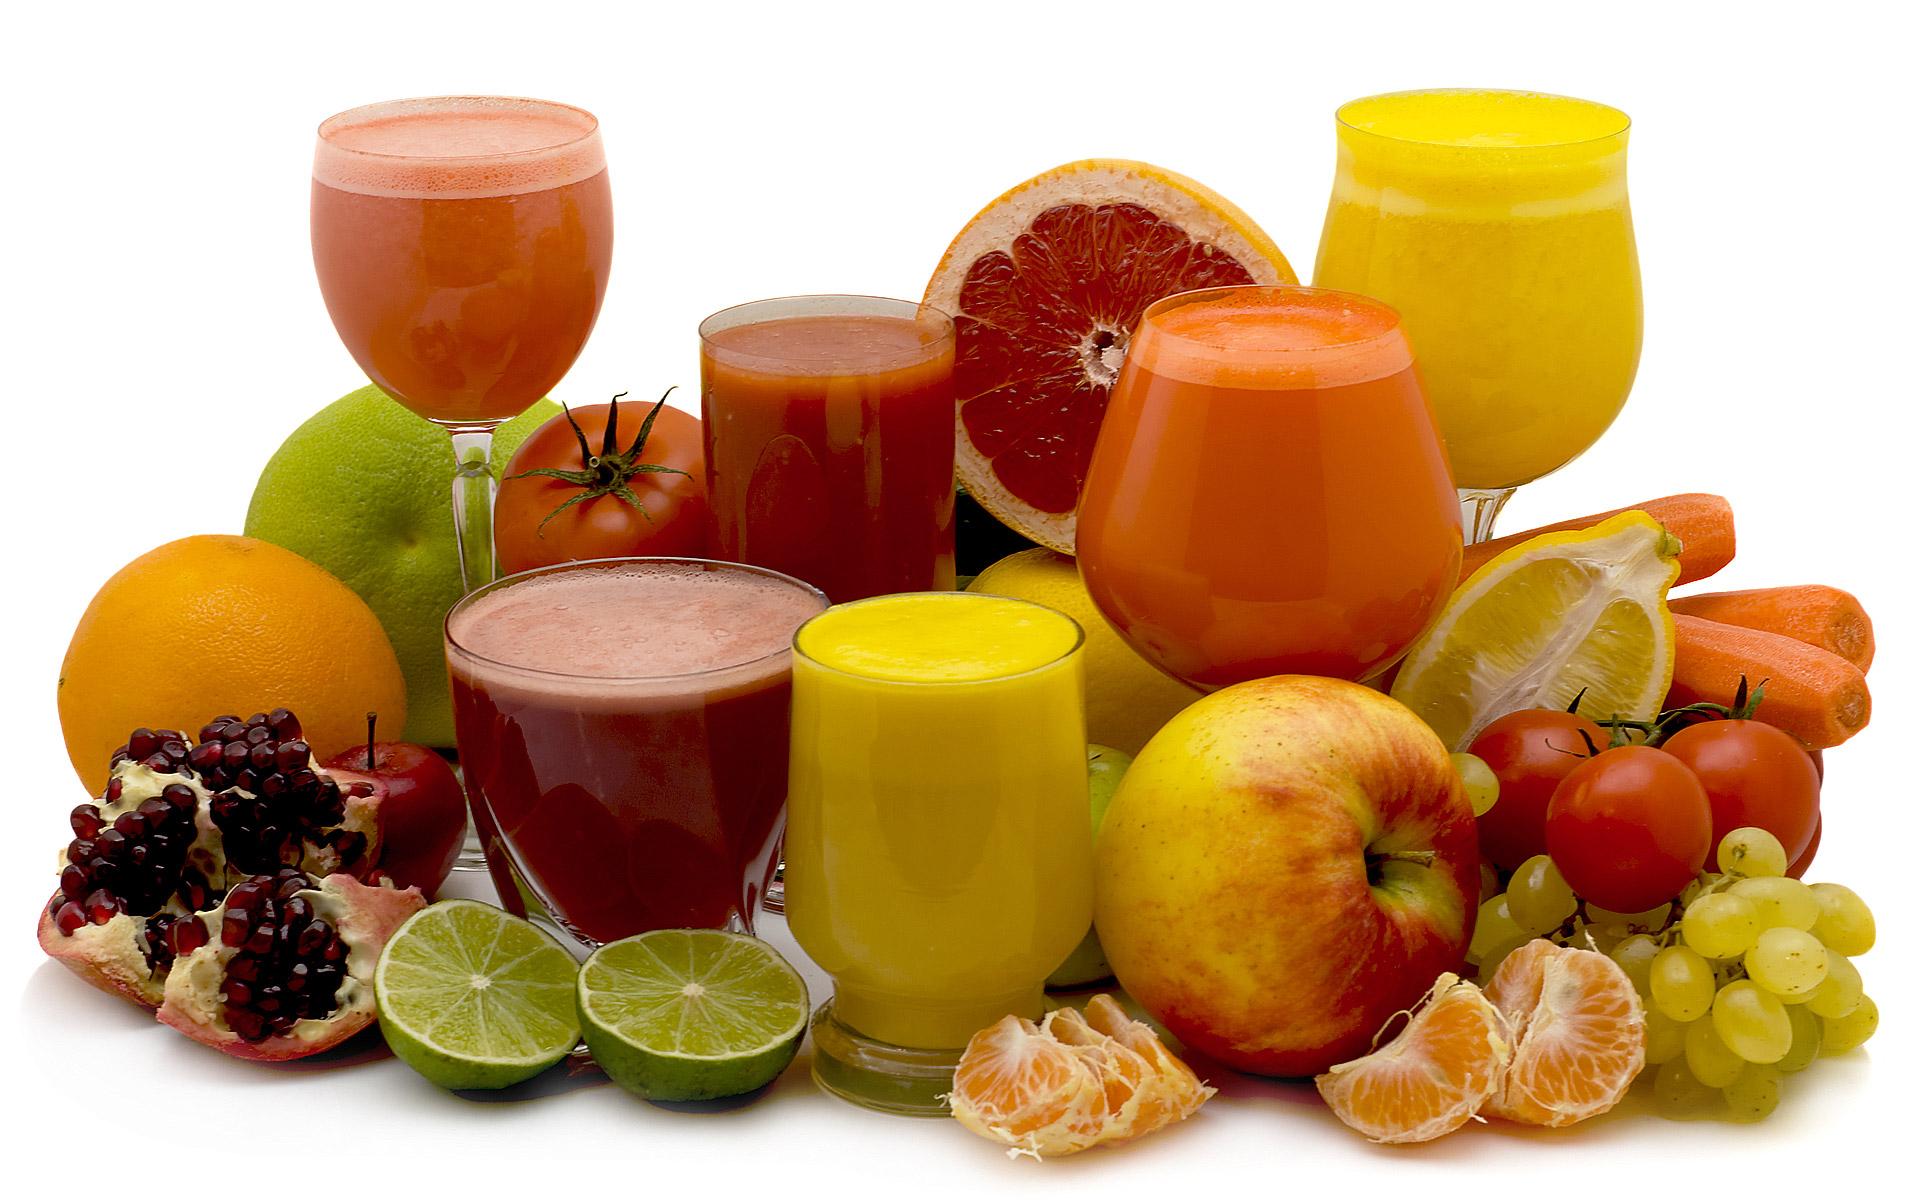 کم خونی تغذیه ای, علل کم خونی, علائم کم خونی